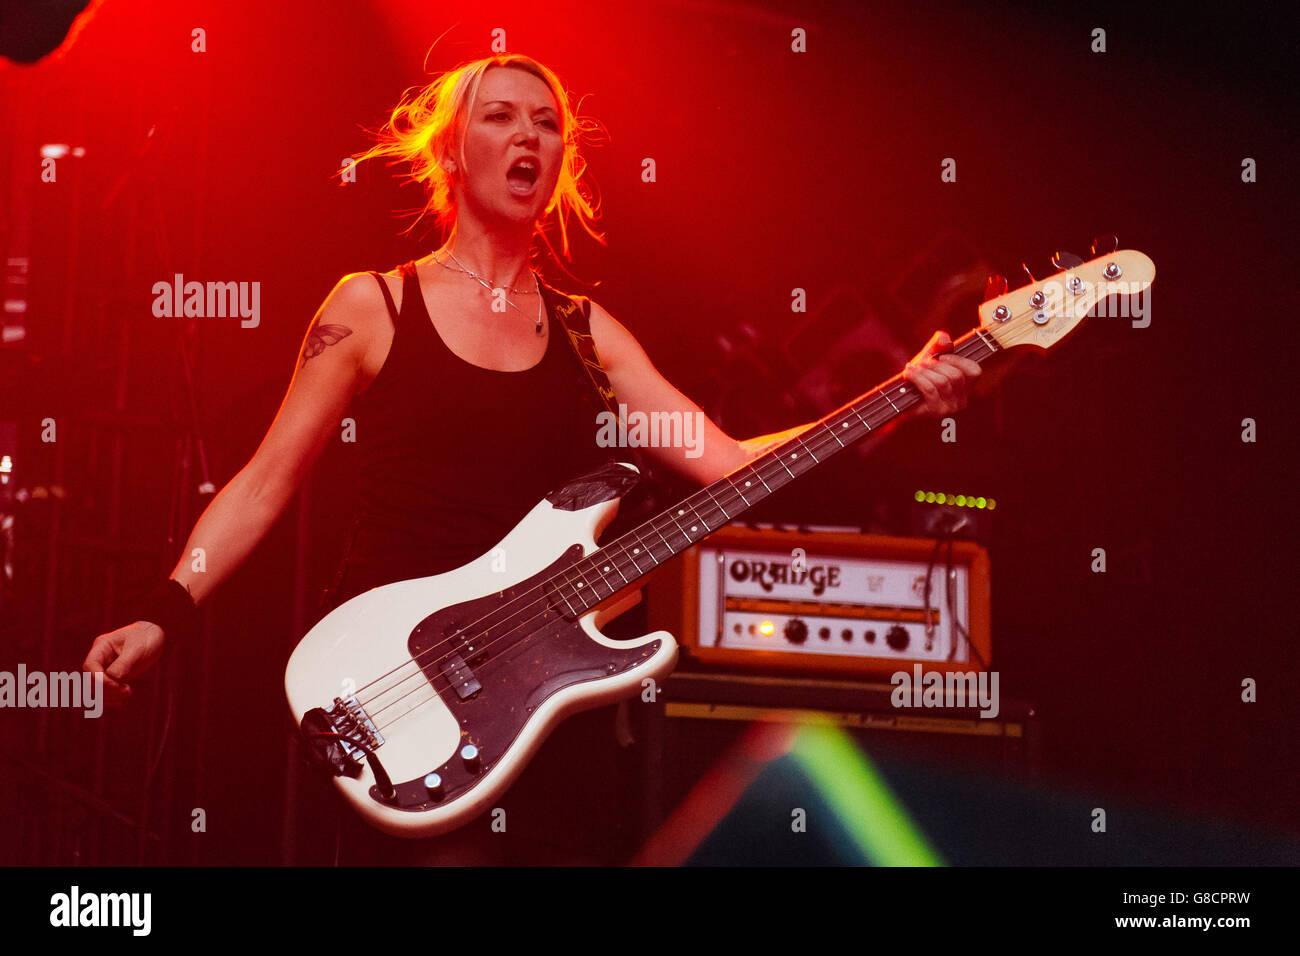 Julia Ruzicka, bassist for Future Of The Left, at Electric Ballroom, London. 21st April 2016. Stock Photo